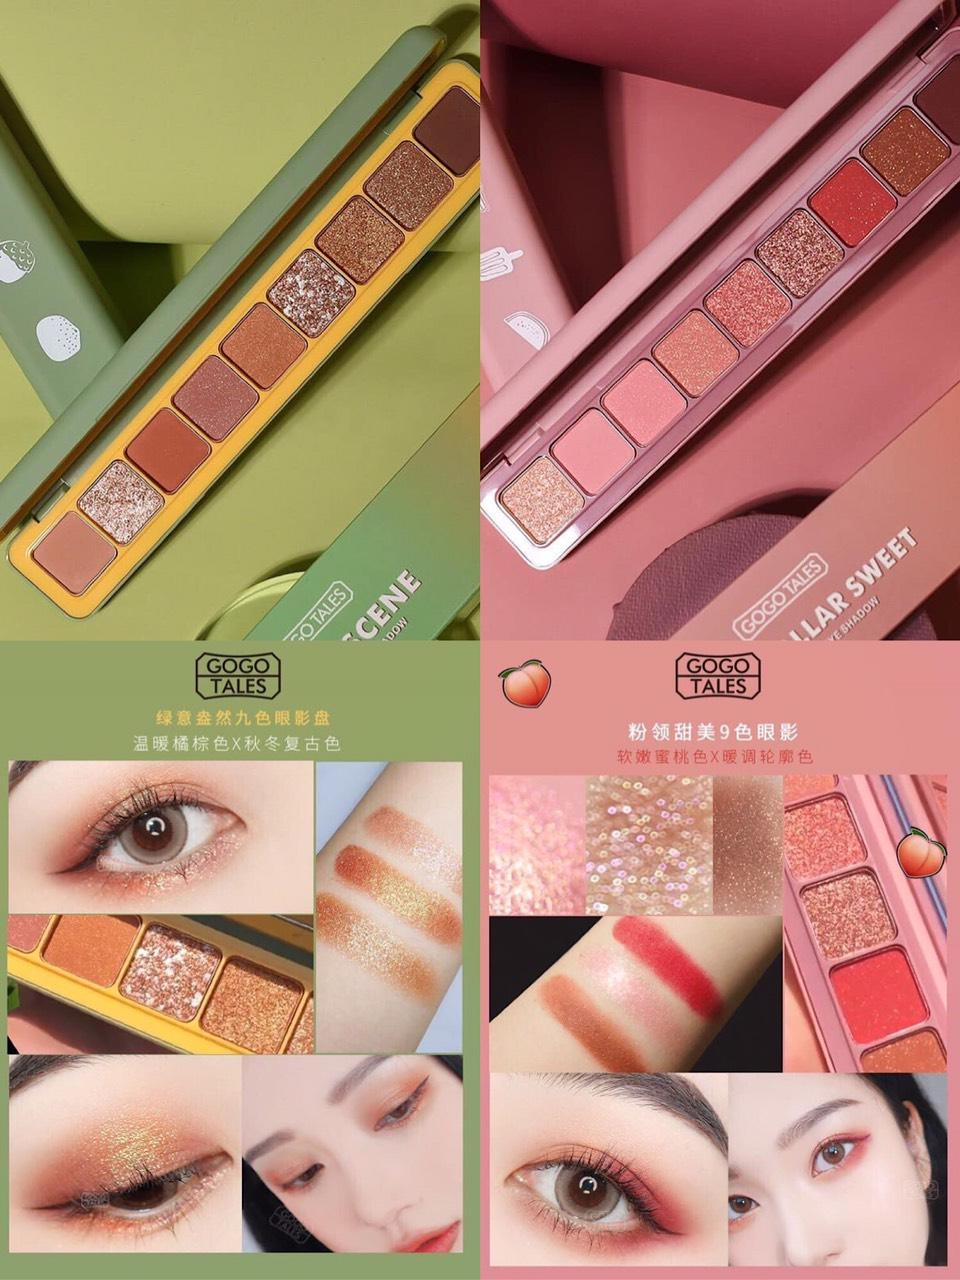 Bảng màu mắt Gogo Tales Nine Color Eye Shadow